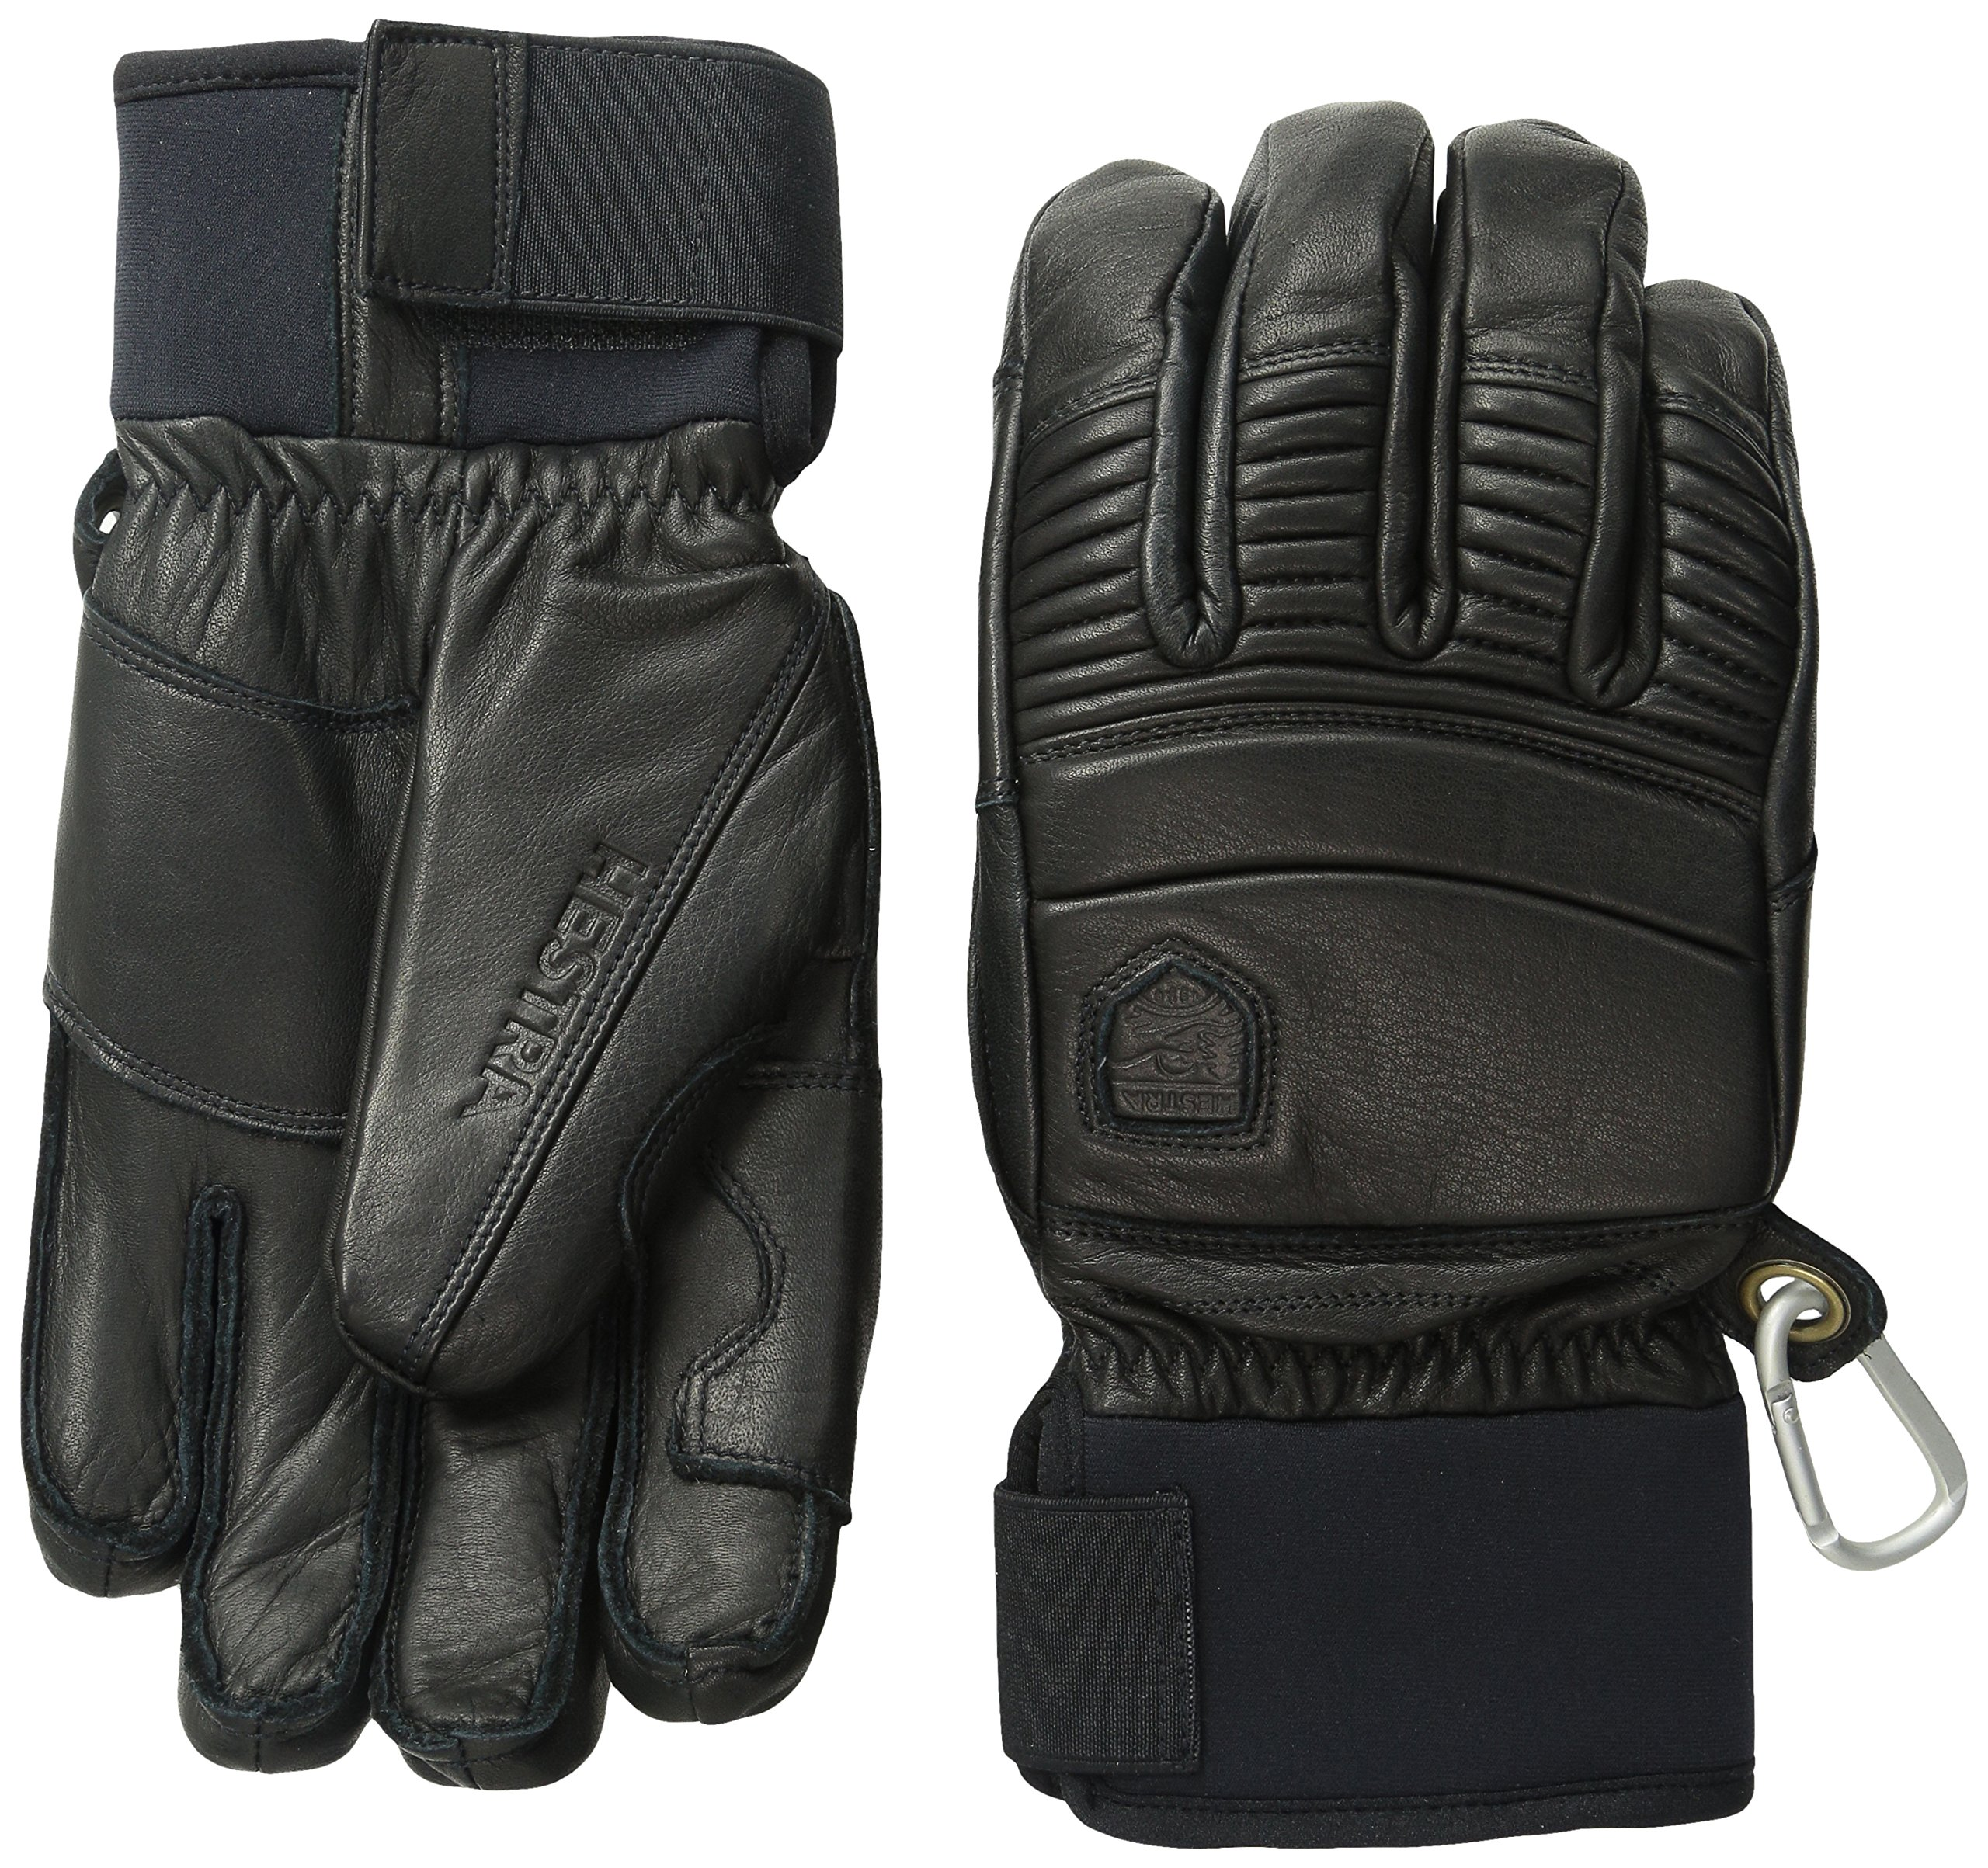 Hestra Fall Line Leather Short Ski, Ride and Park Glove,Black,10